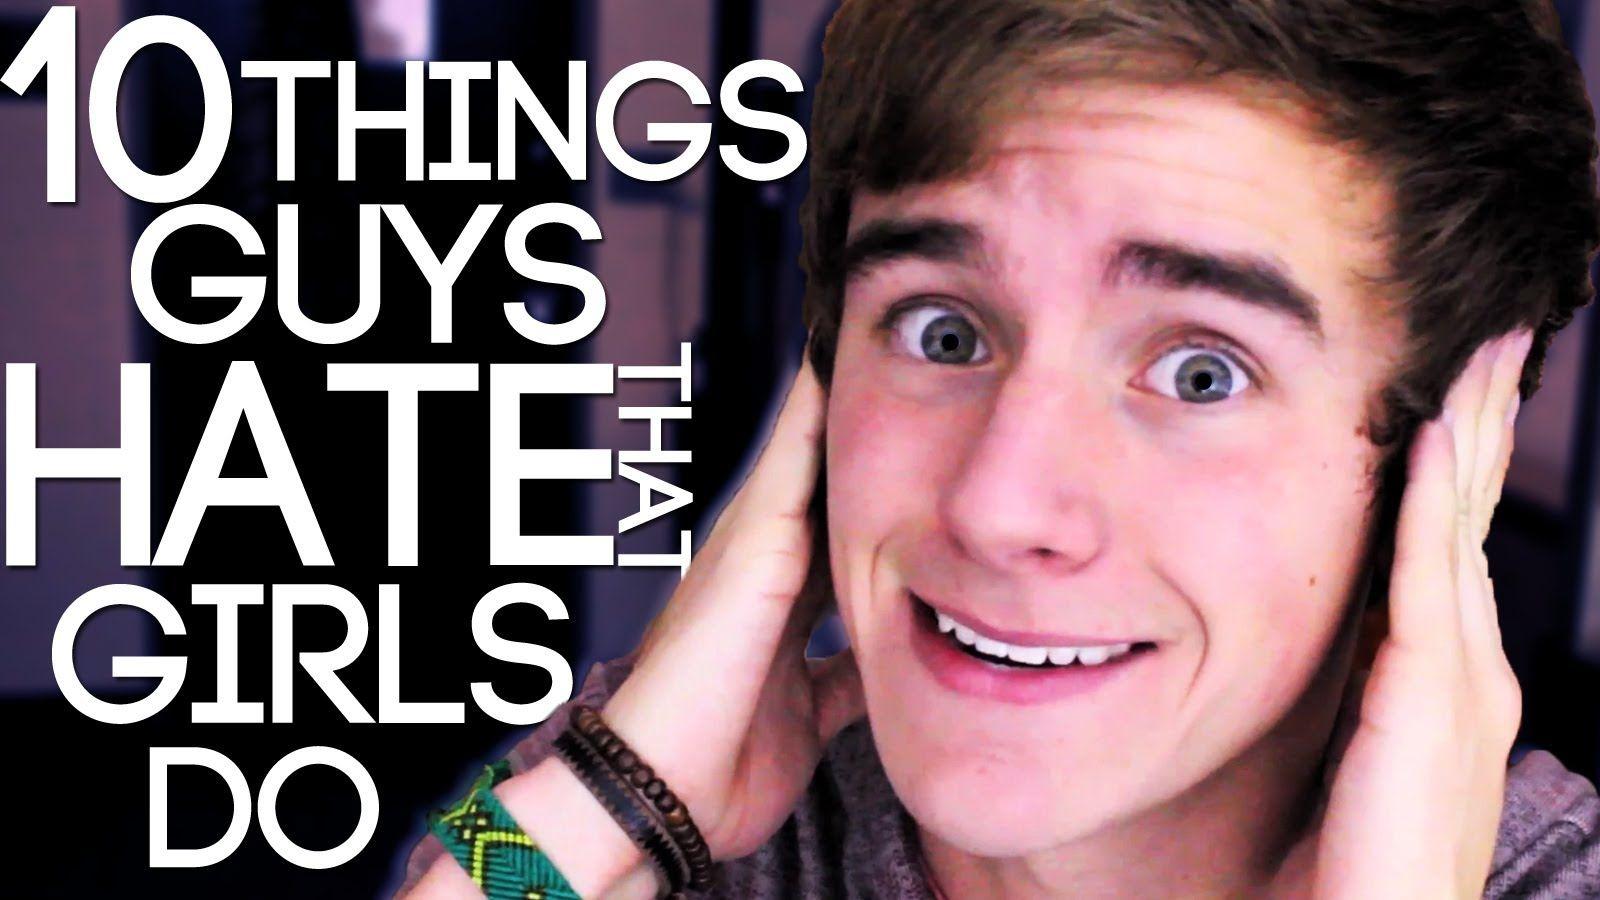 10 Traits Girls Do That Guys Hate